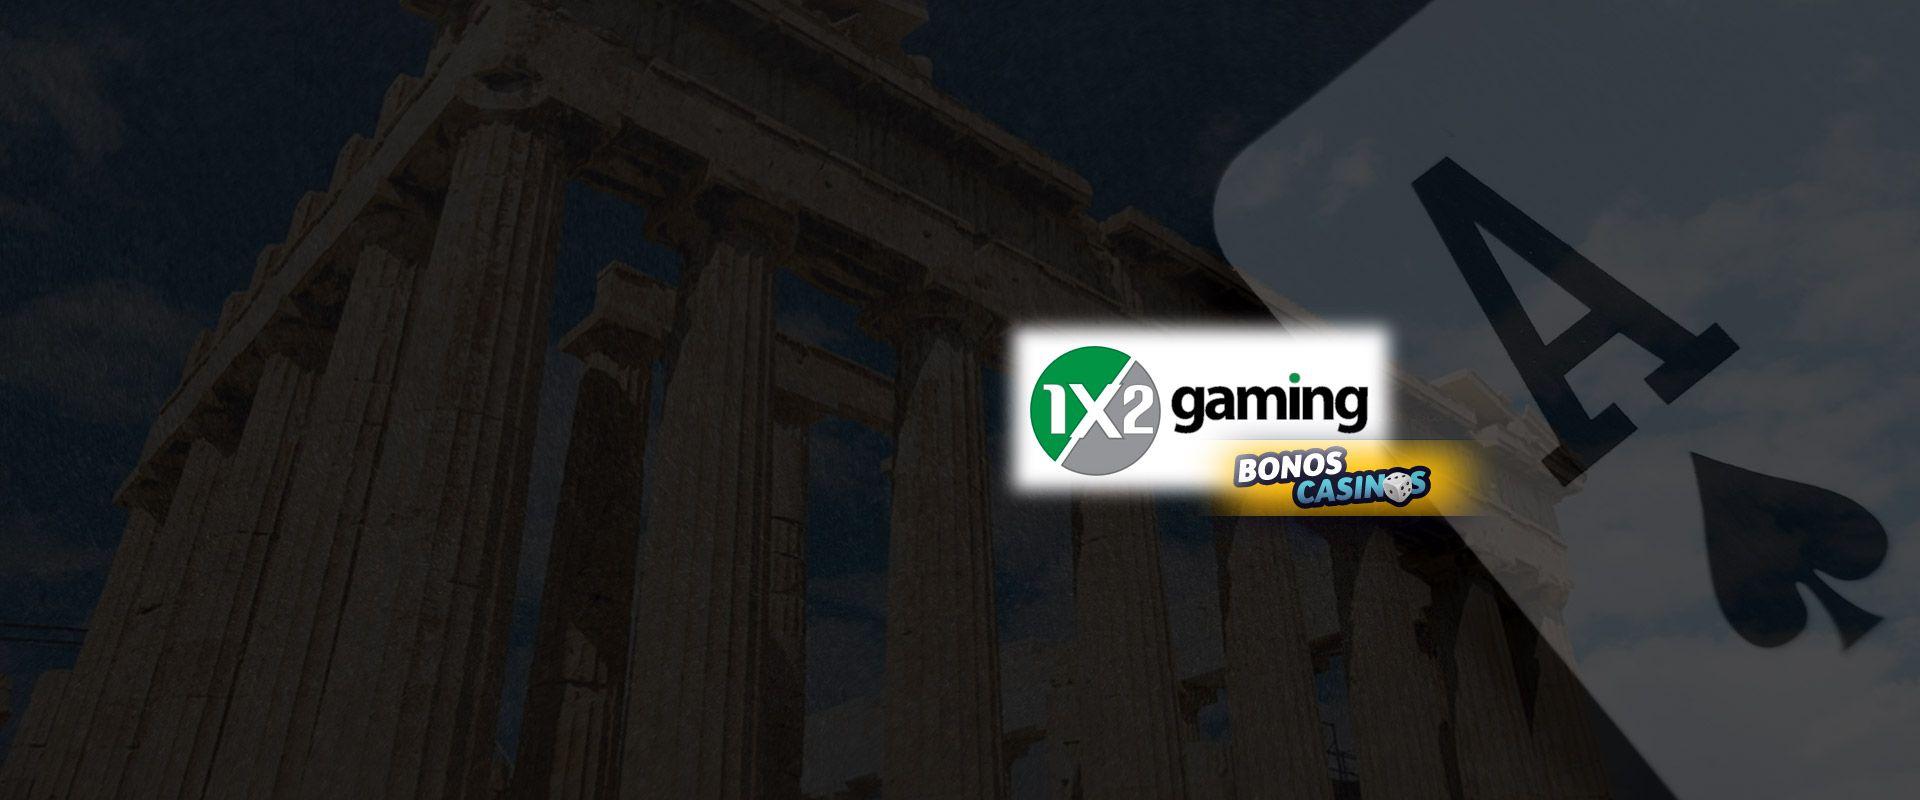 logo de 1x2 Network incursiona en mercado griego para casinos